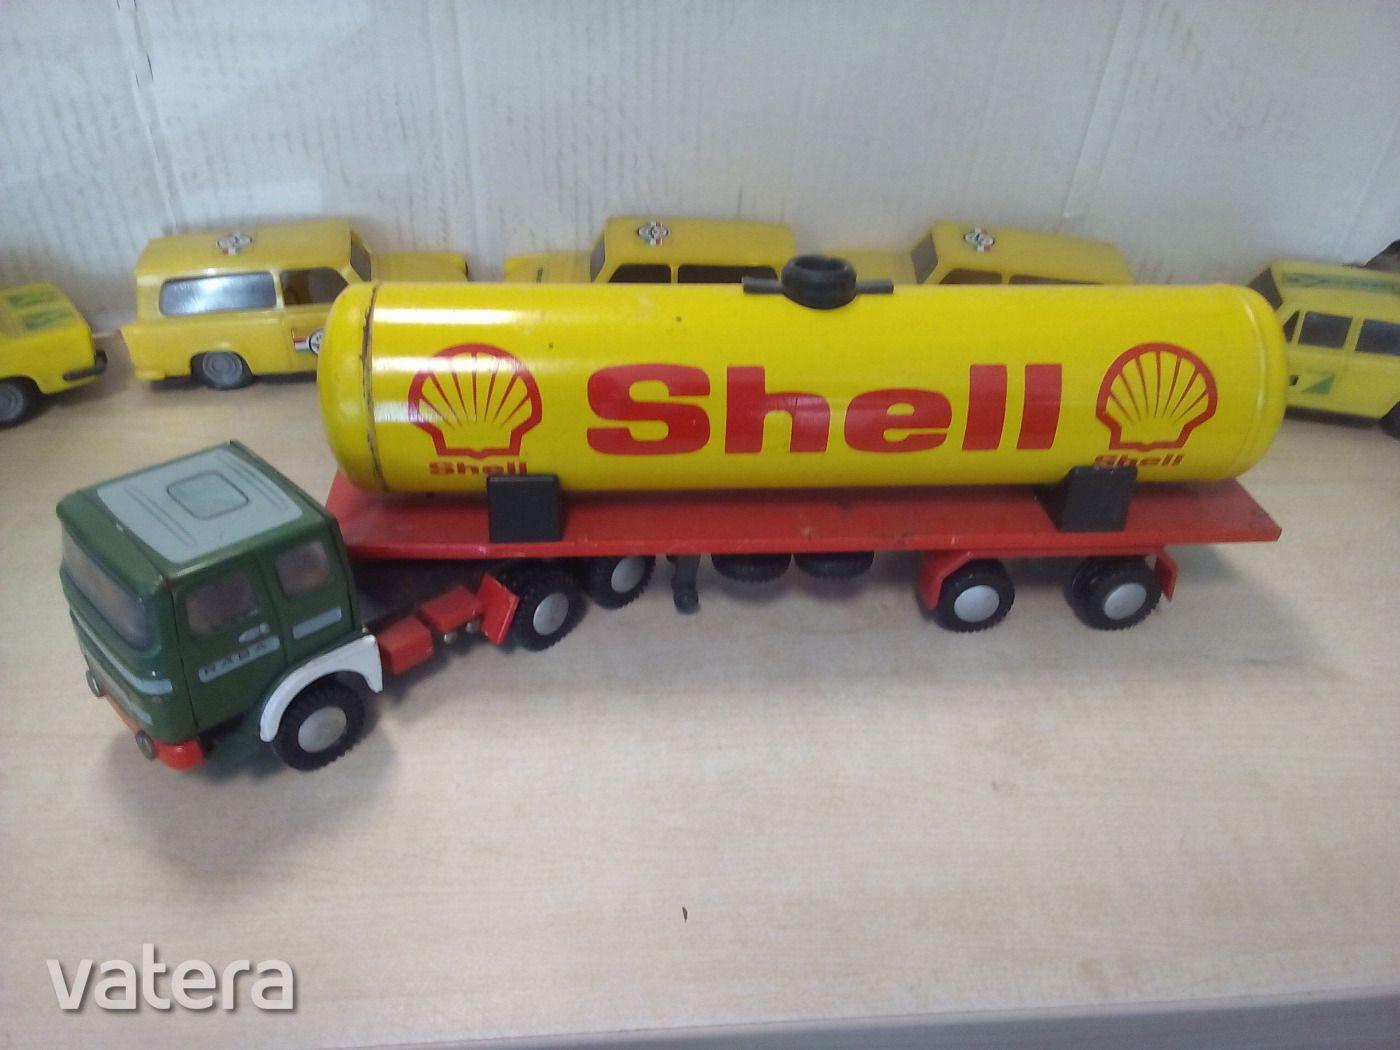 raba-tartalyos-nyerges-vontato-kamion-shell-lemezarugyar-c95a_1_big.jpg